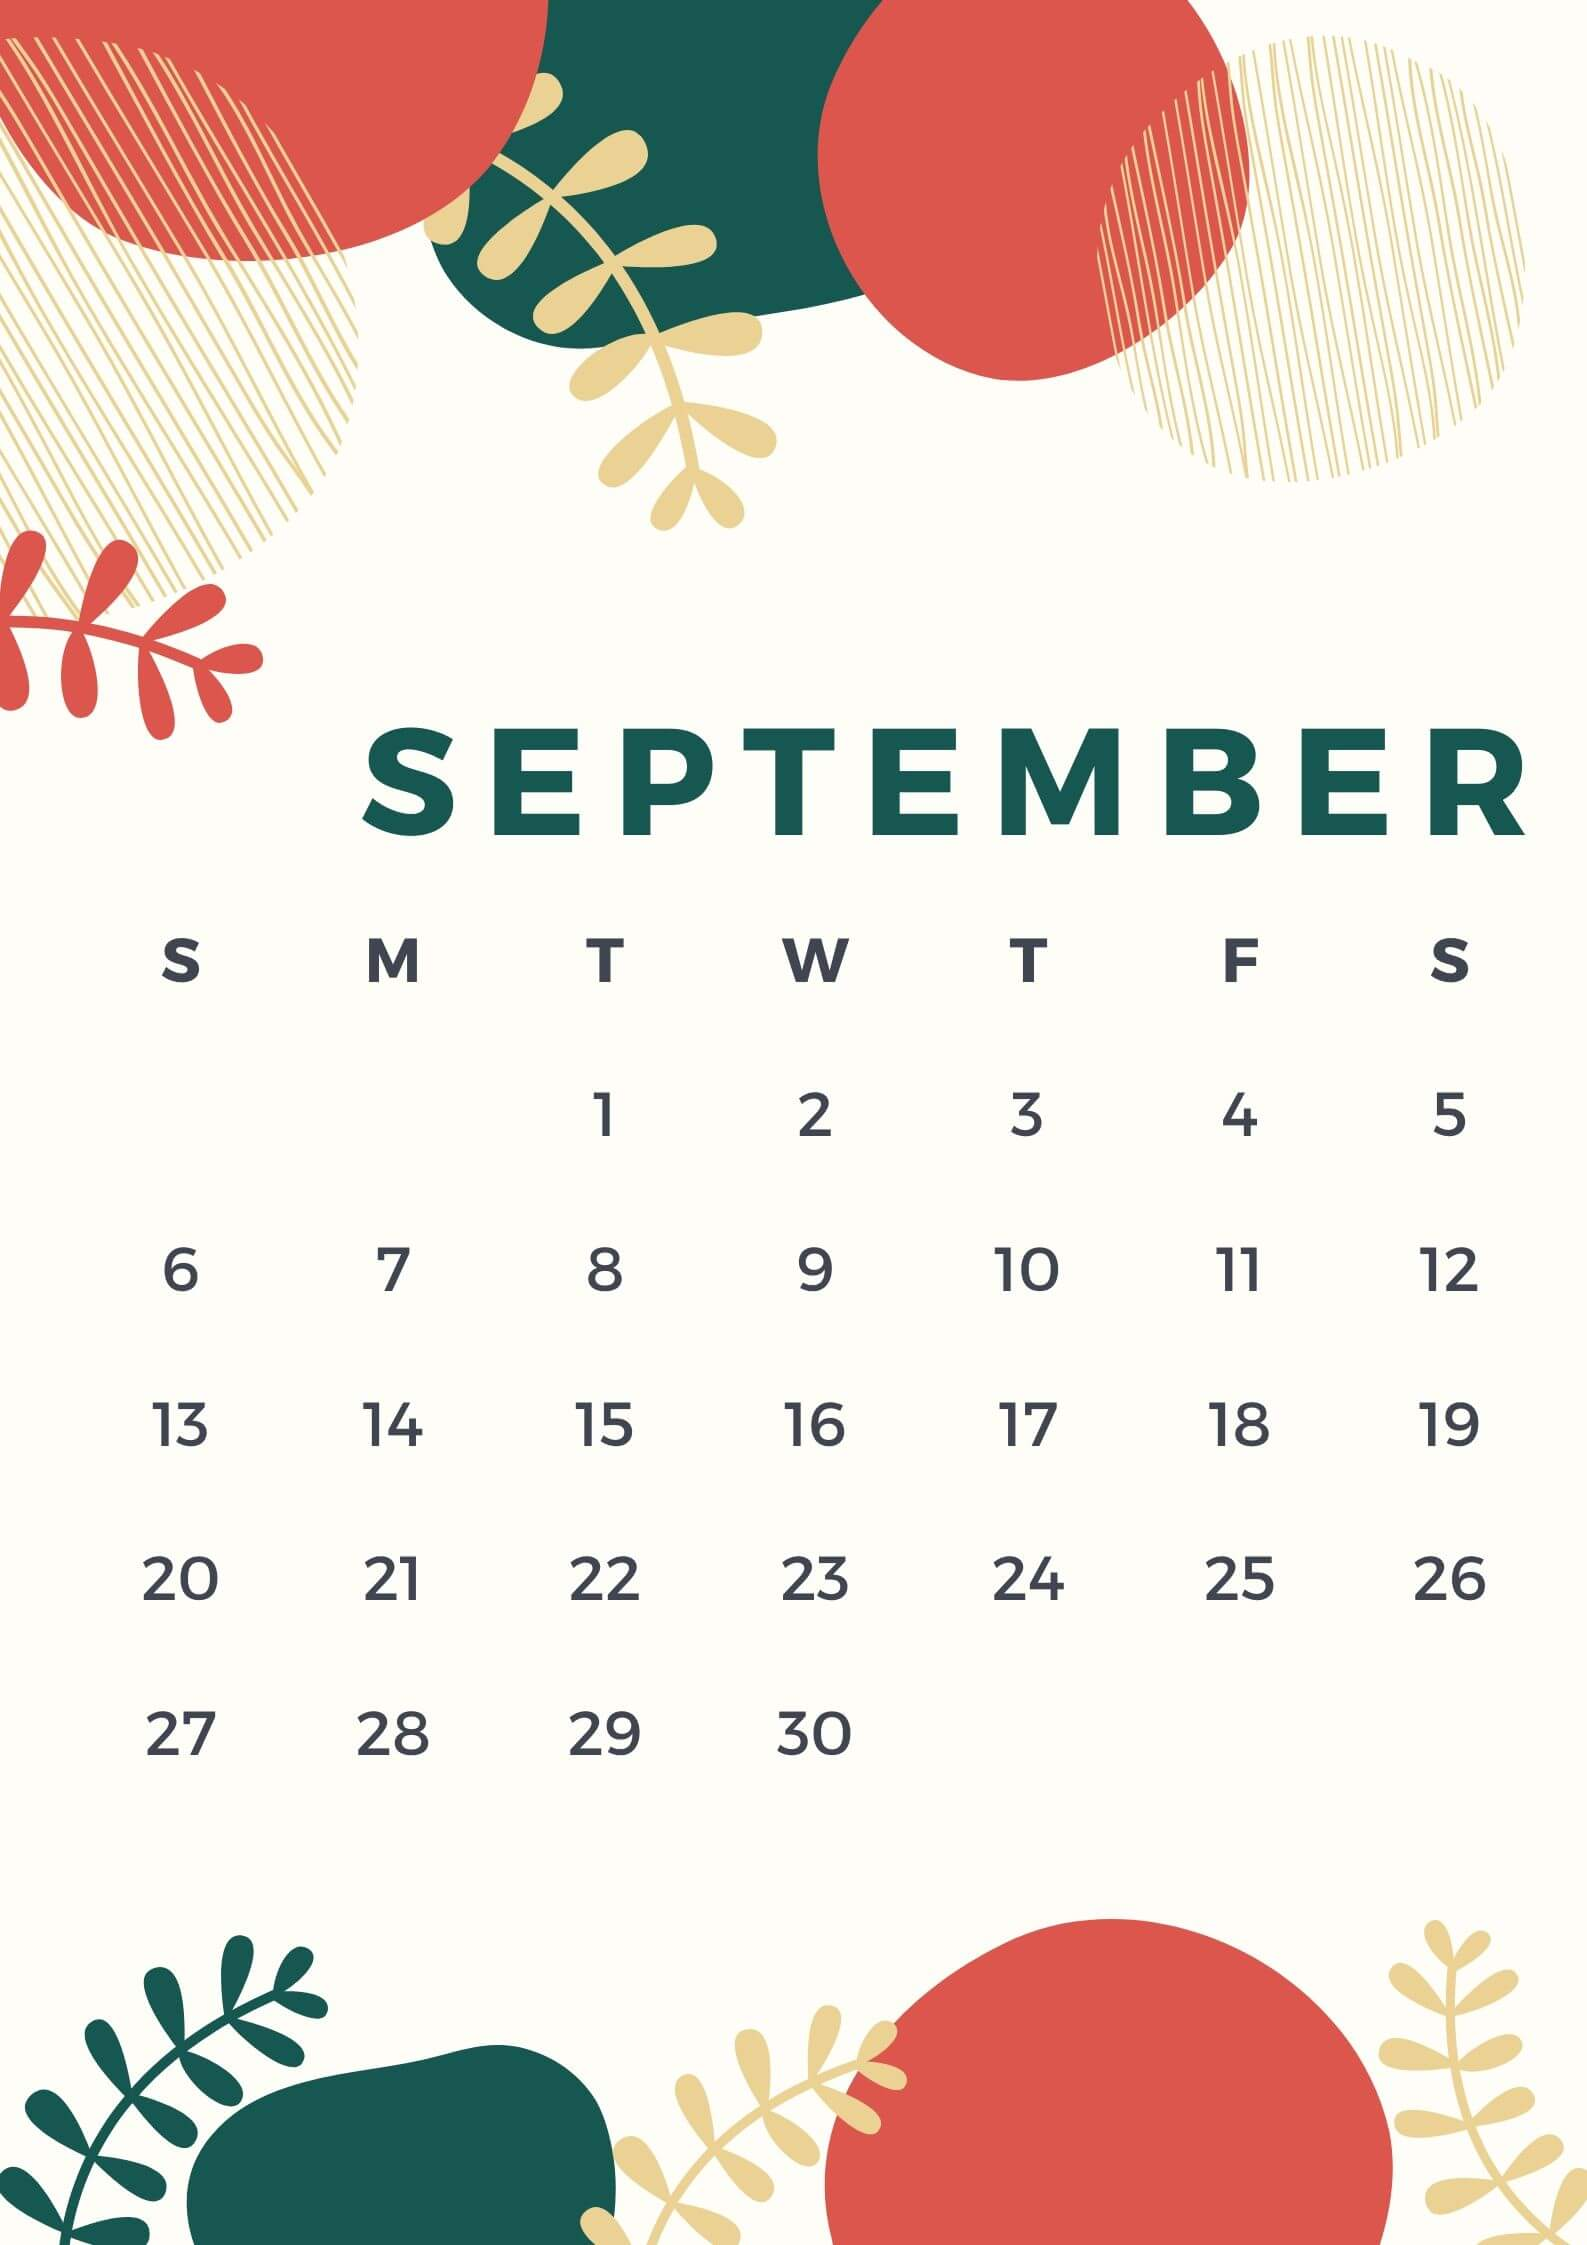 Cute September 2020 Calendar Design